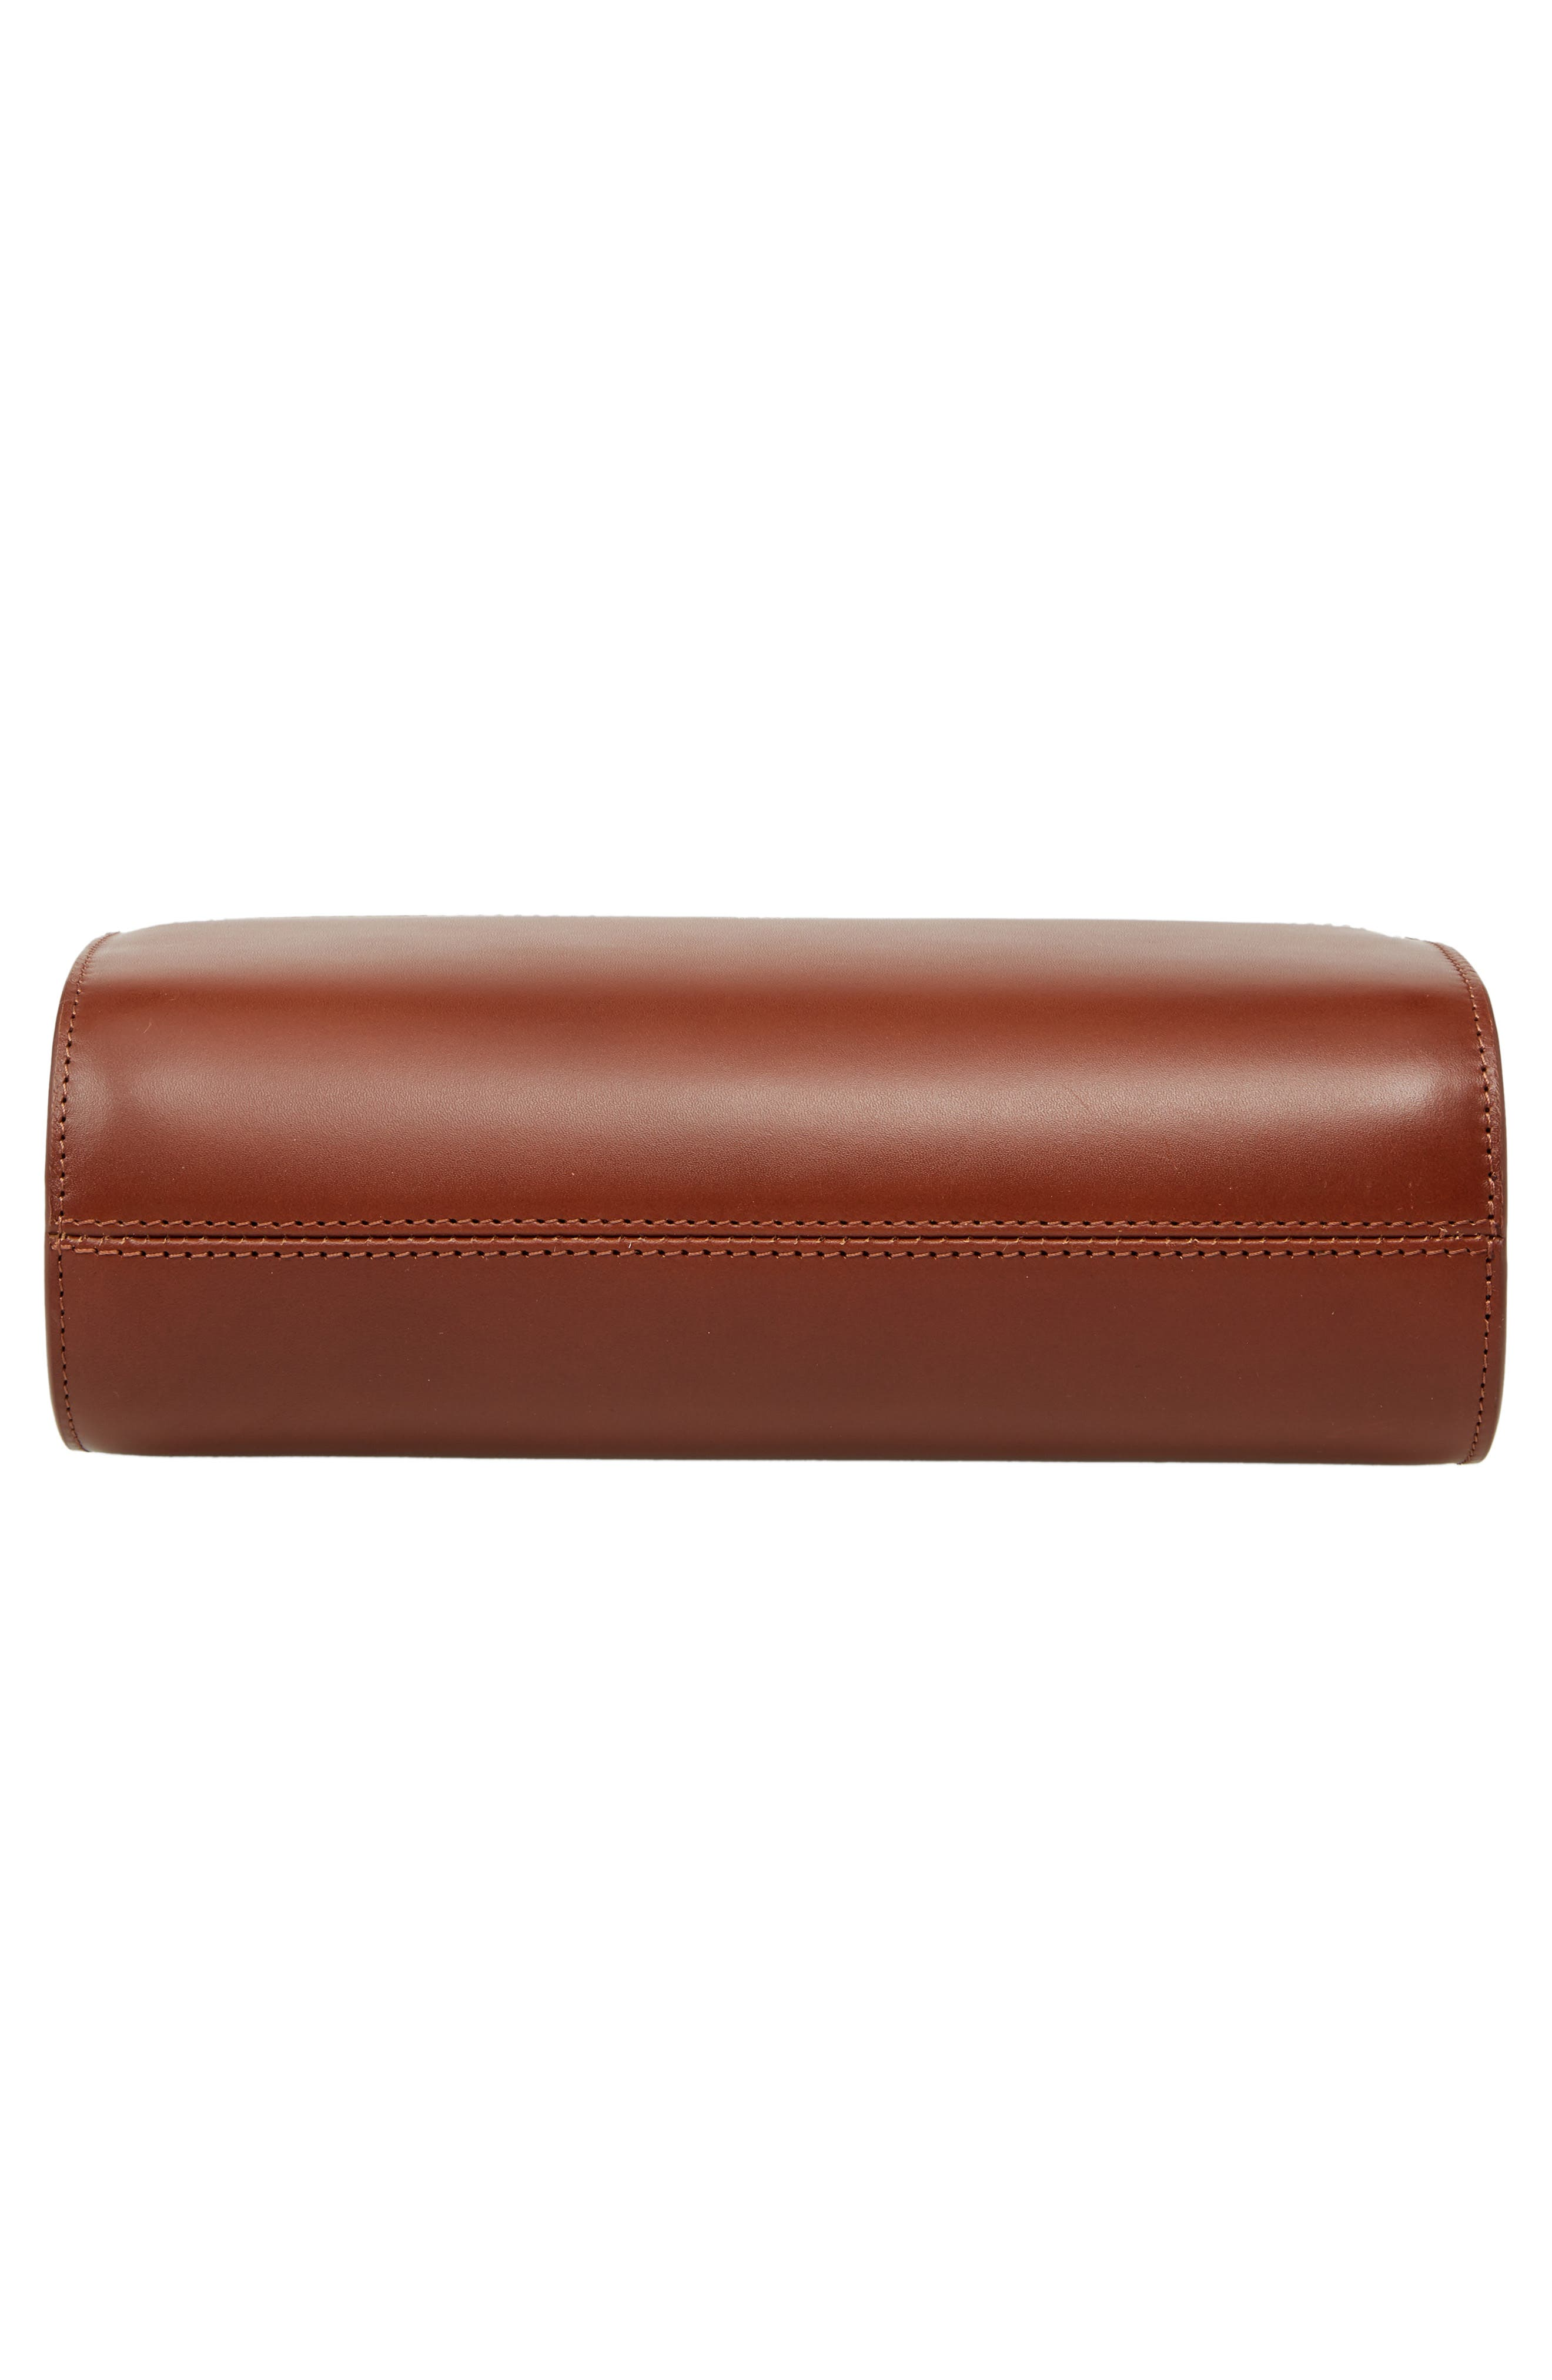 Sac Demilune Leather & Denim Crossbody Bag,                             Alternate thumbnail 6, color,                             NOISETTE CAD